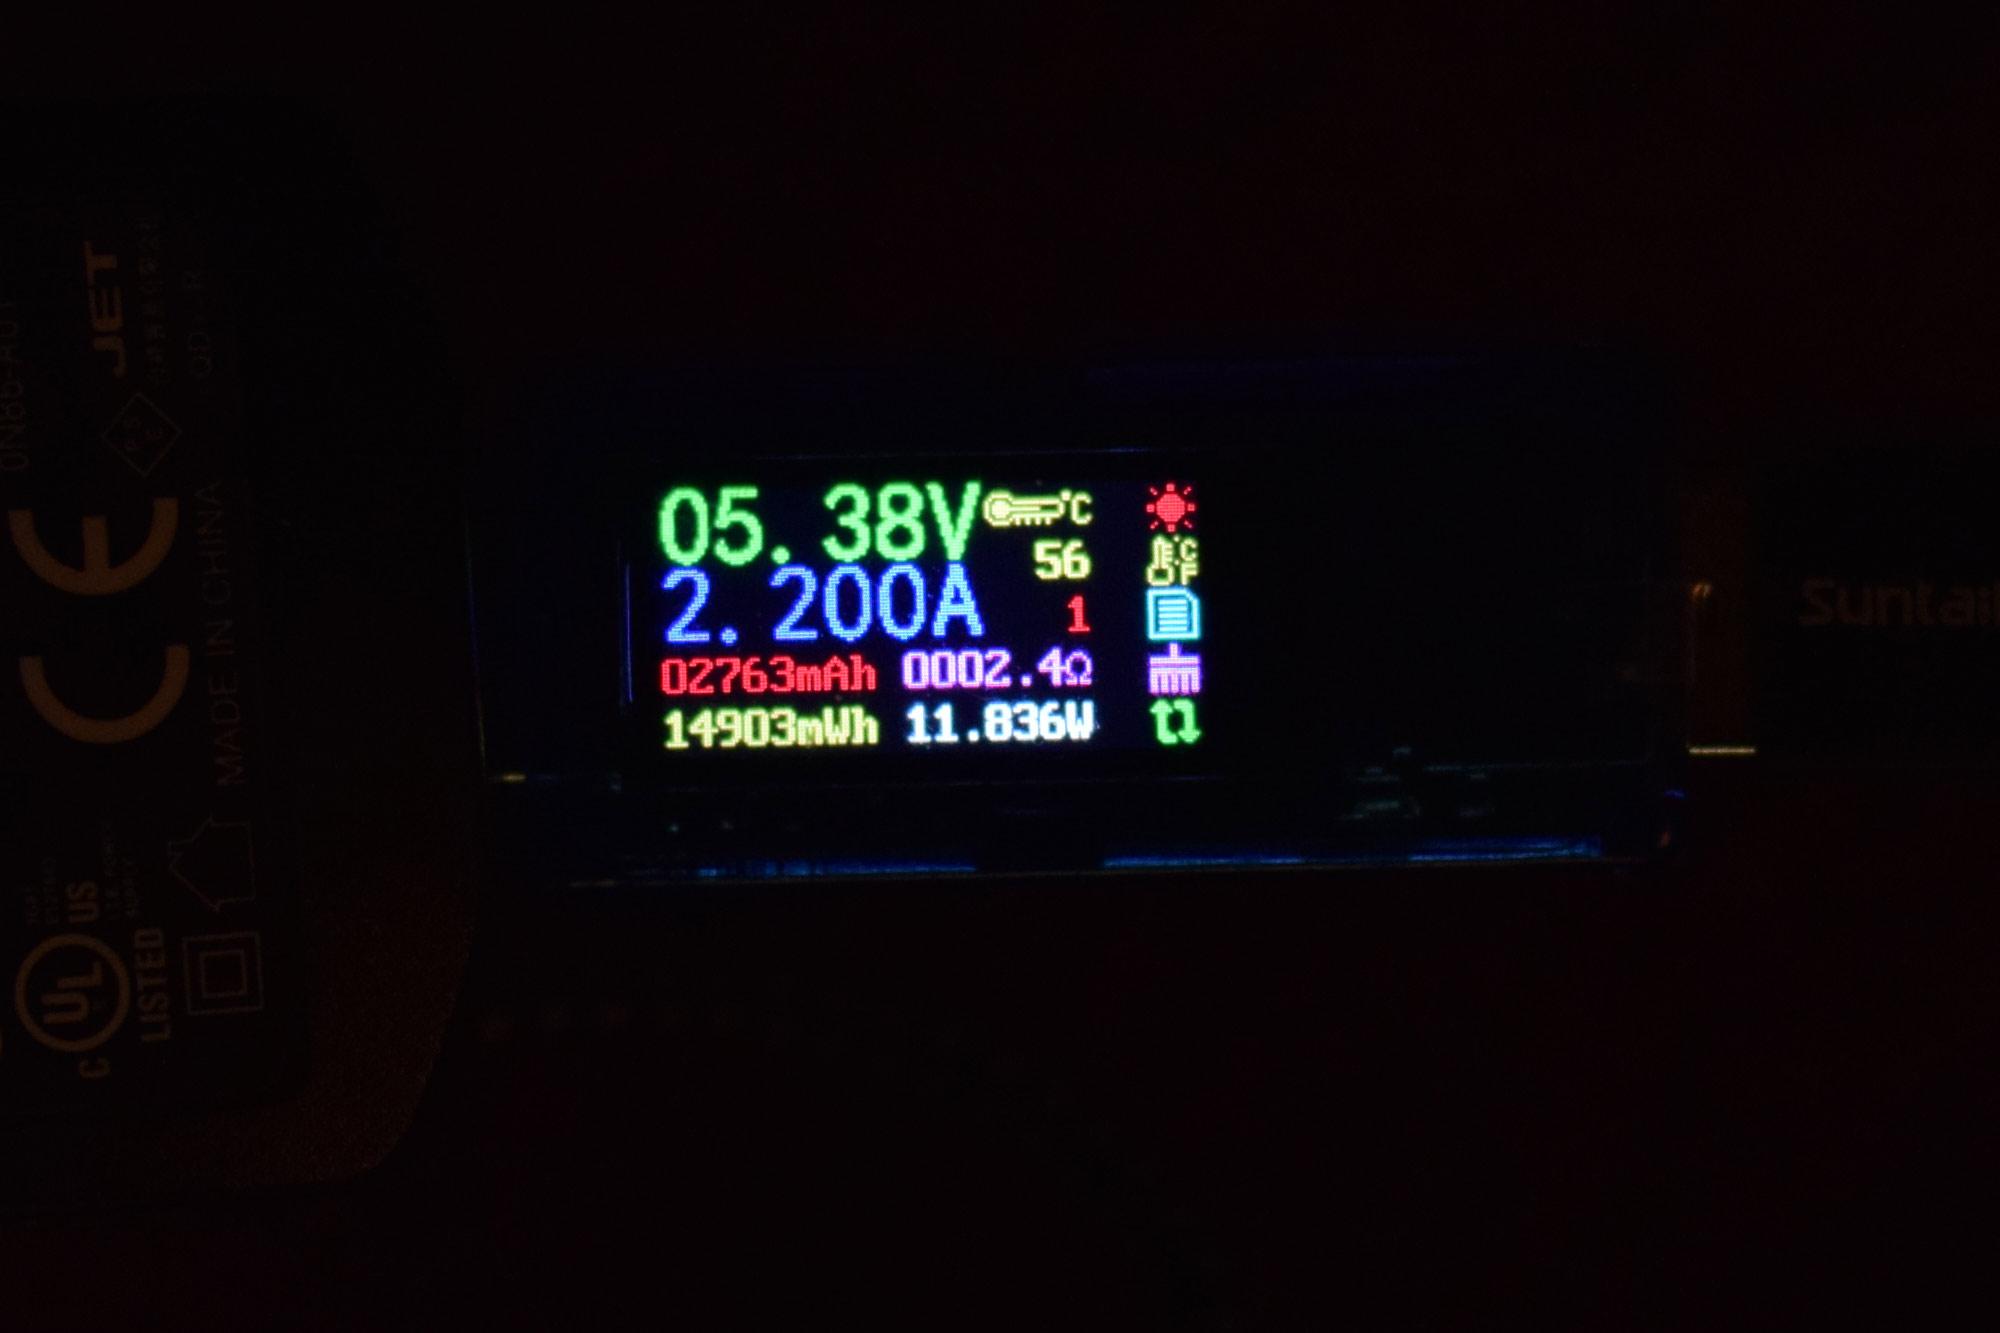 GamePi43 maximale Stromstärke